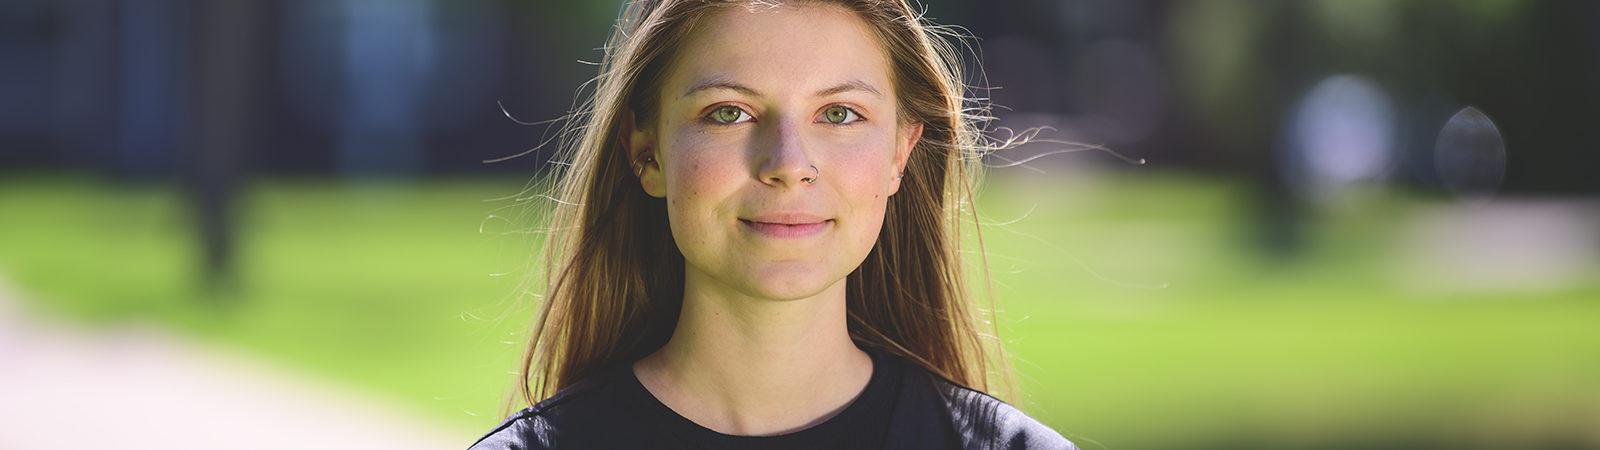 Tara Padovan